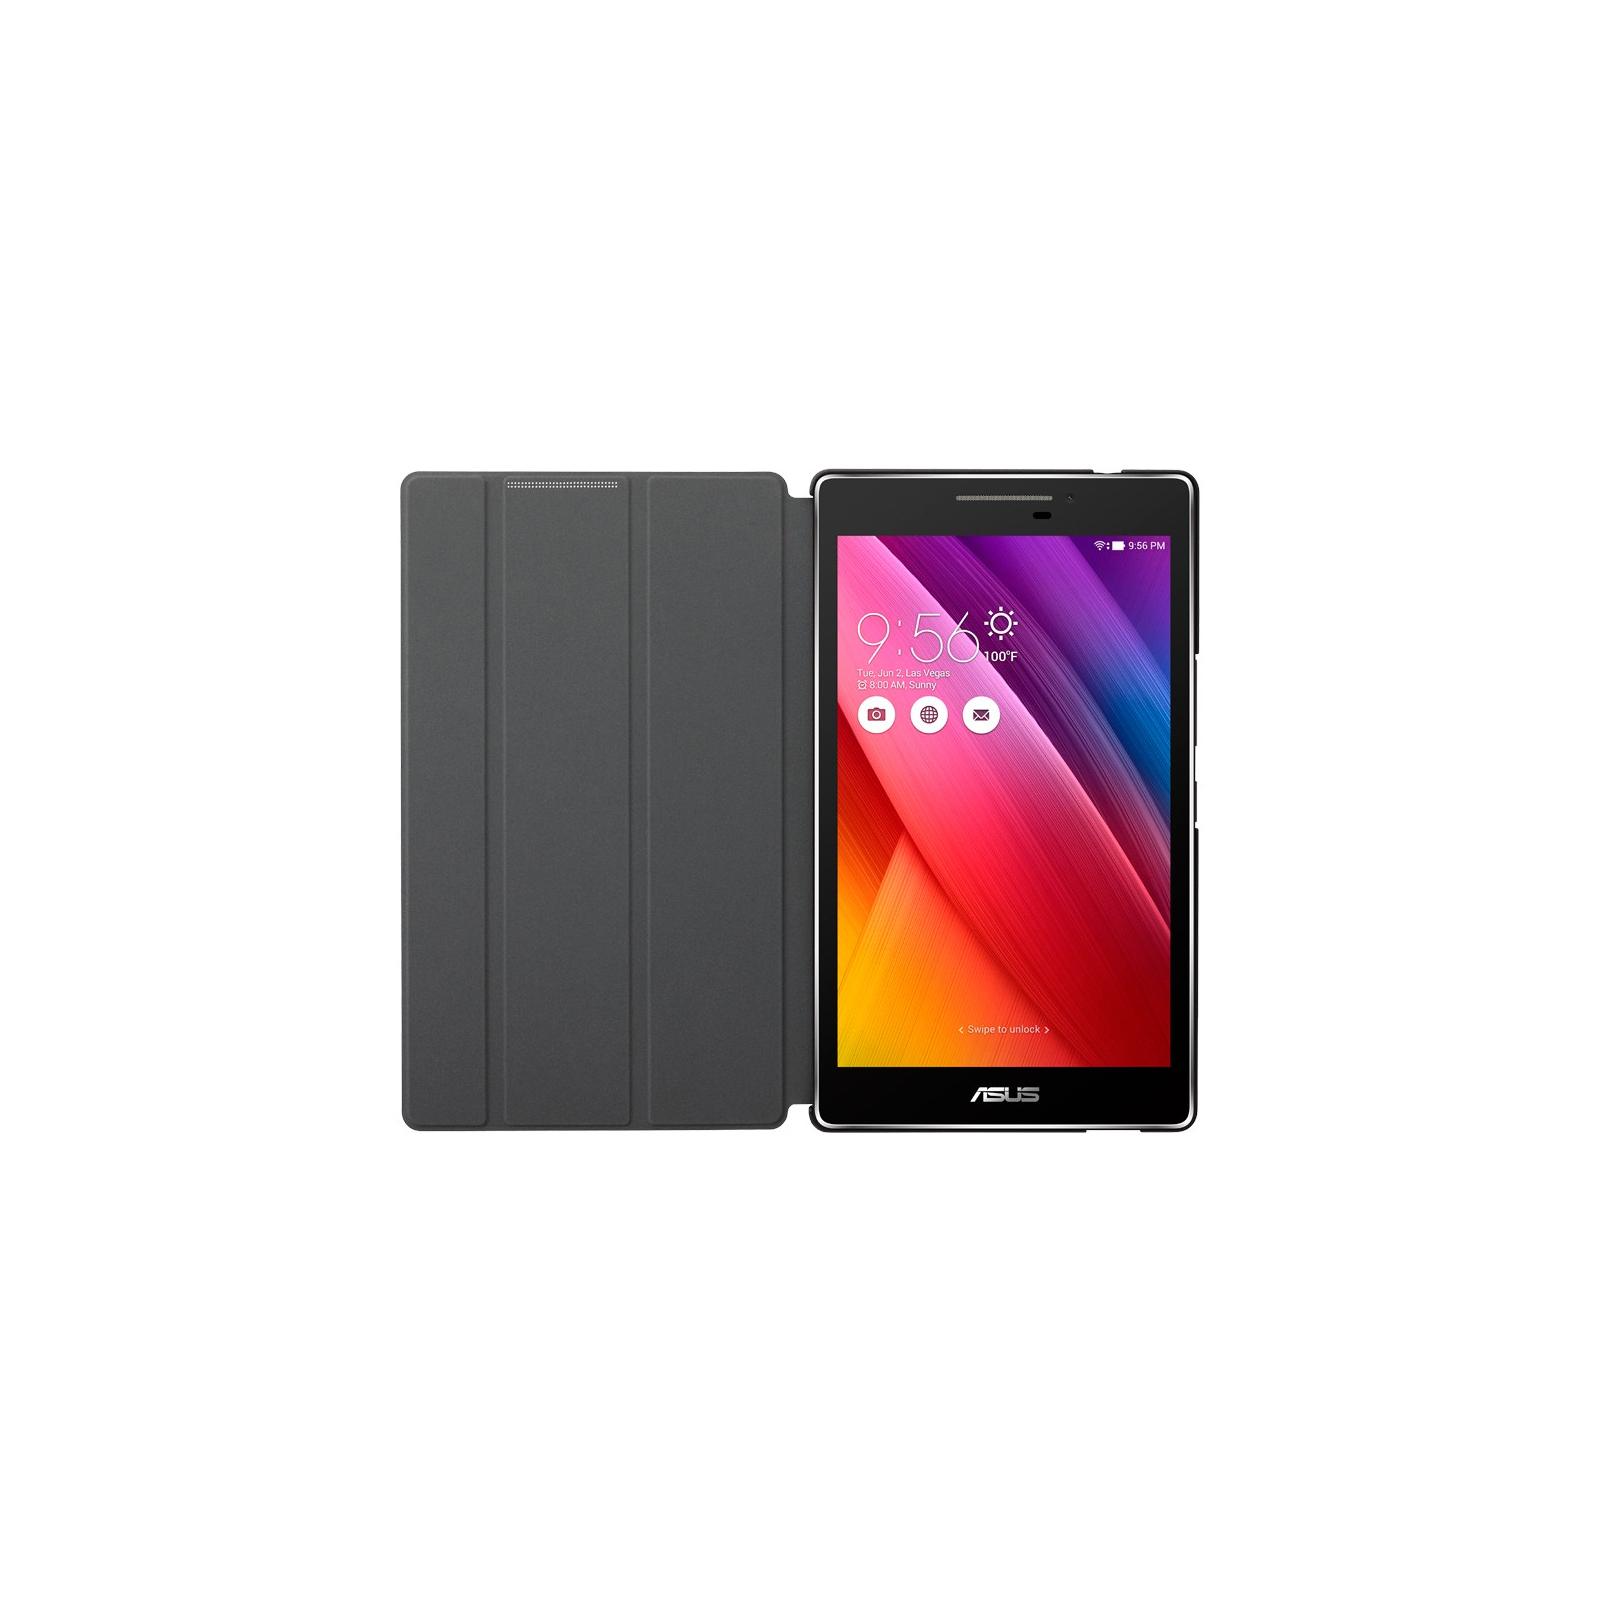 "Чехол для планшета ASUS ZenPad C 7.0"" TriCover Z370C / Z370CG Black (90XB015P-BSL2X0) изображение 3"